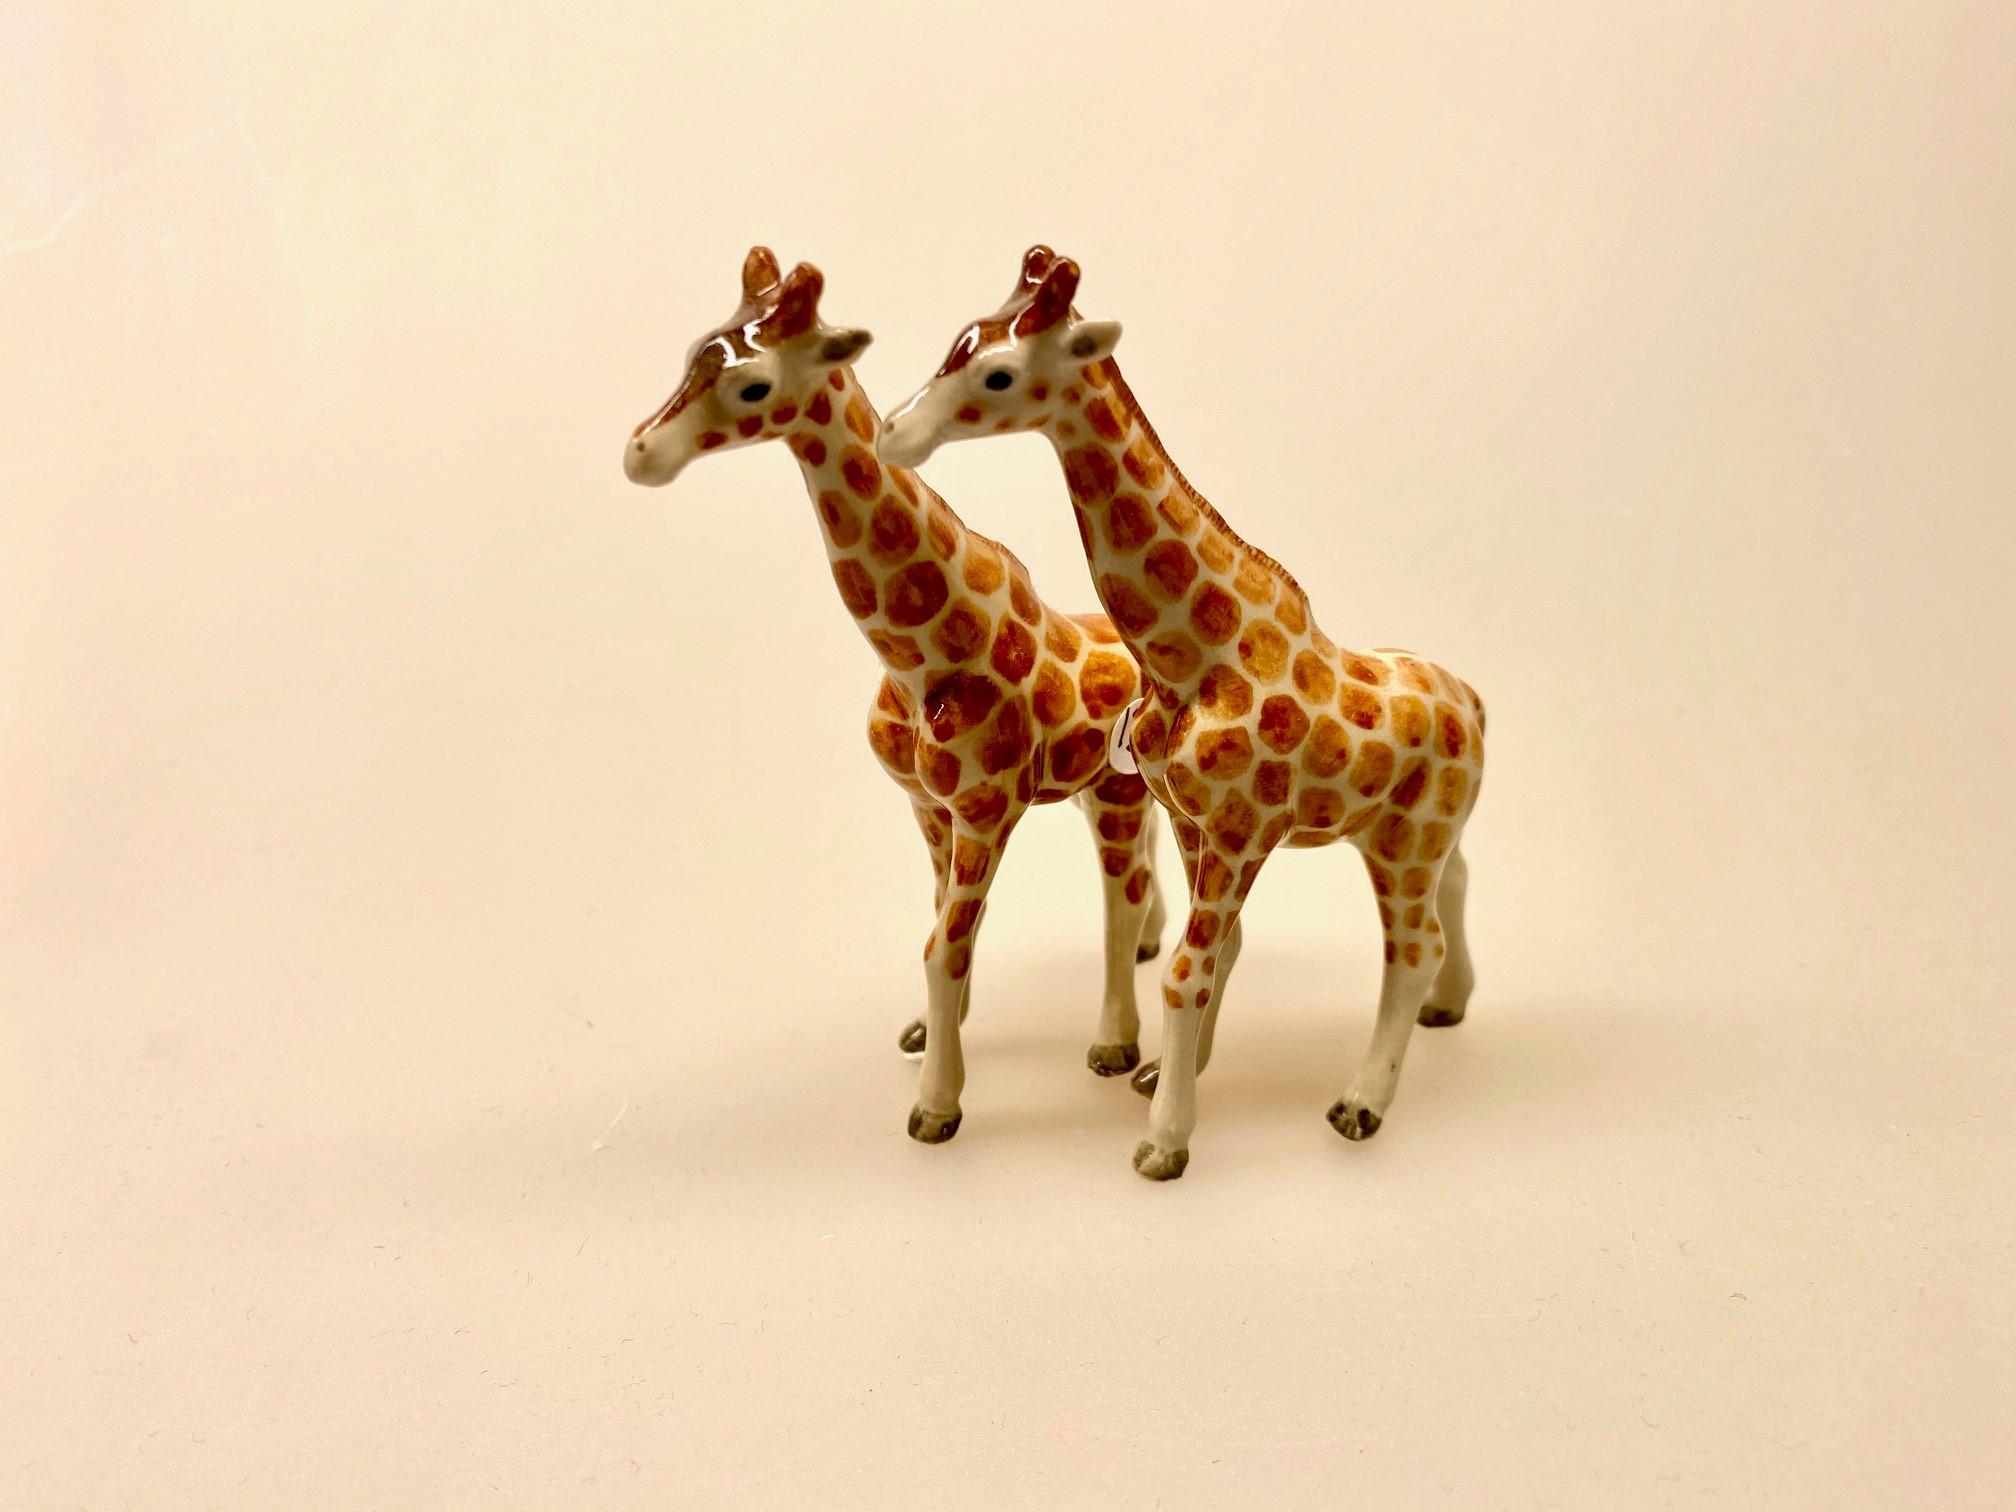 Giraf Figur porcelæn, porcelæn, porcelænsfigur, porcelænsdyr, porcelænsgiraf, af porcelæn, giraf, giraffer, se giraffen, savanne, savannens dyr, storvildt, safari, zoo, zoologisk have, samler, sættekasse, sætterkasse, amagerhylde, biti, ribe, vilde dyr, afrika, afrikas dyr, afrikanske